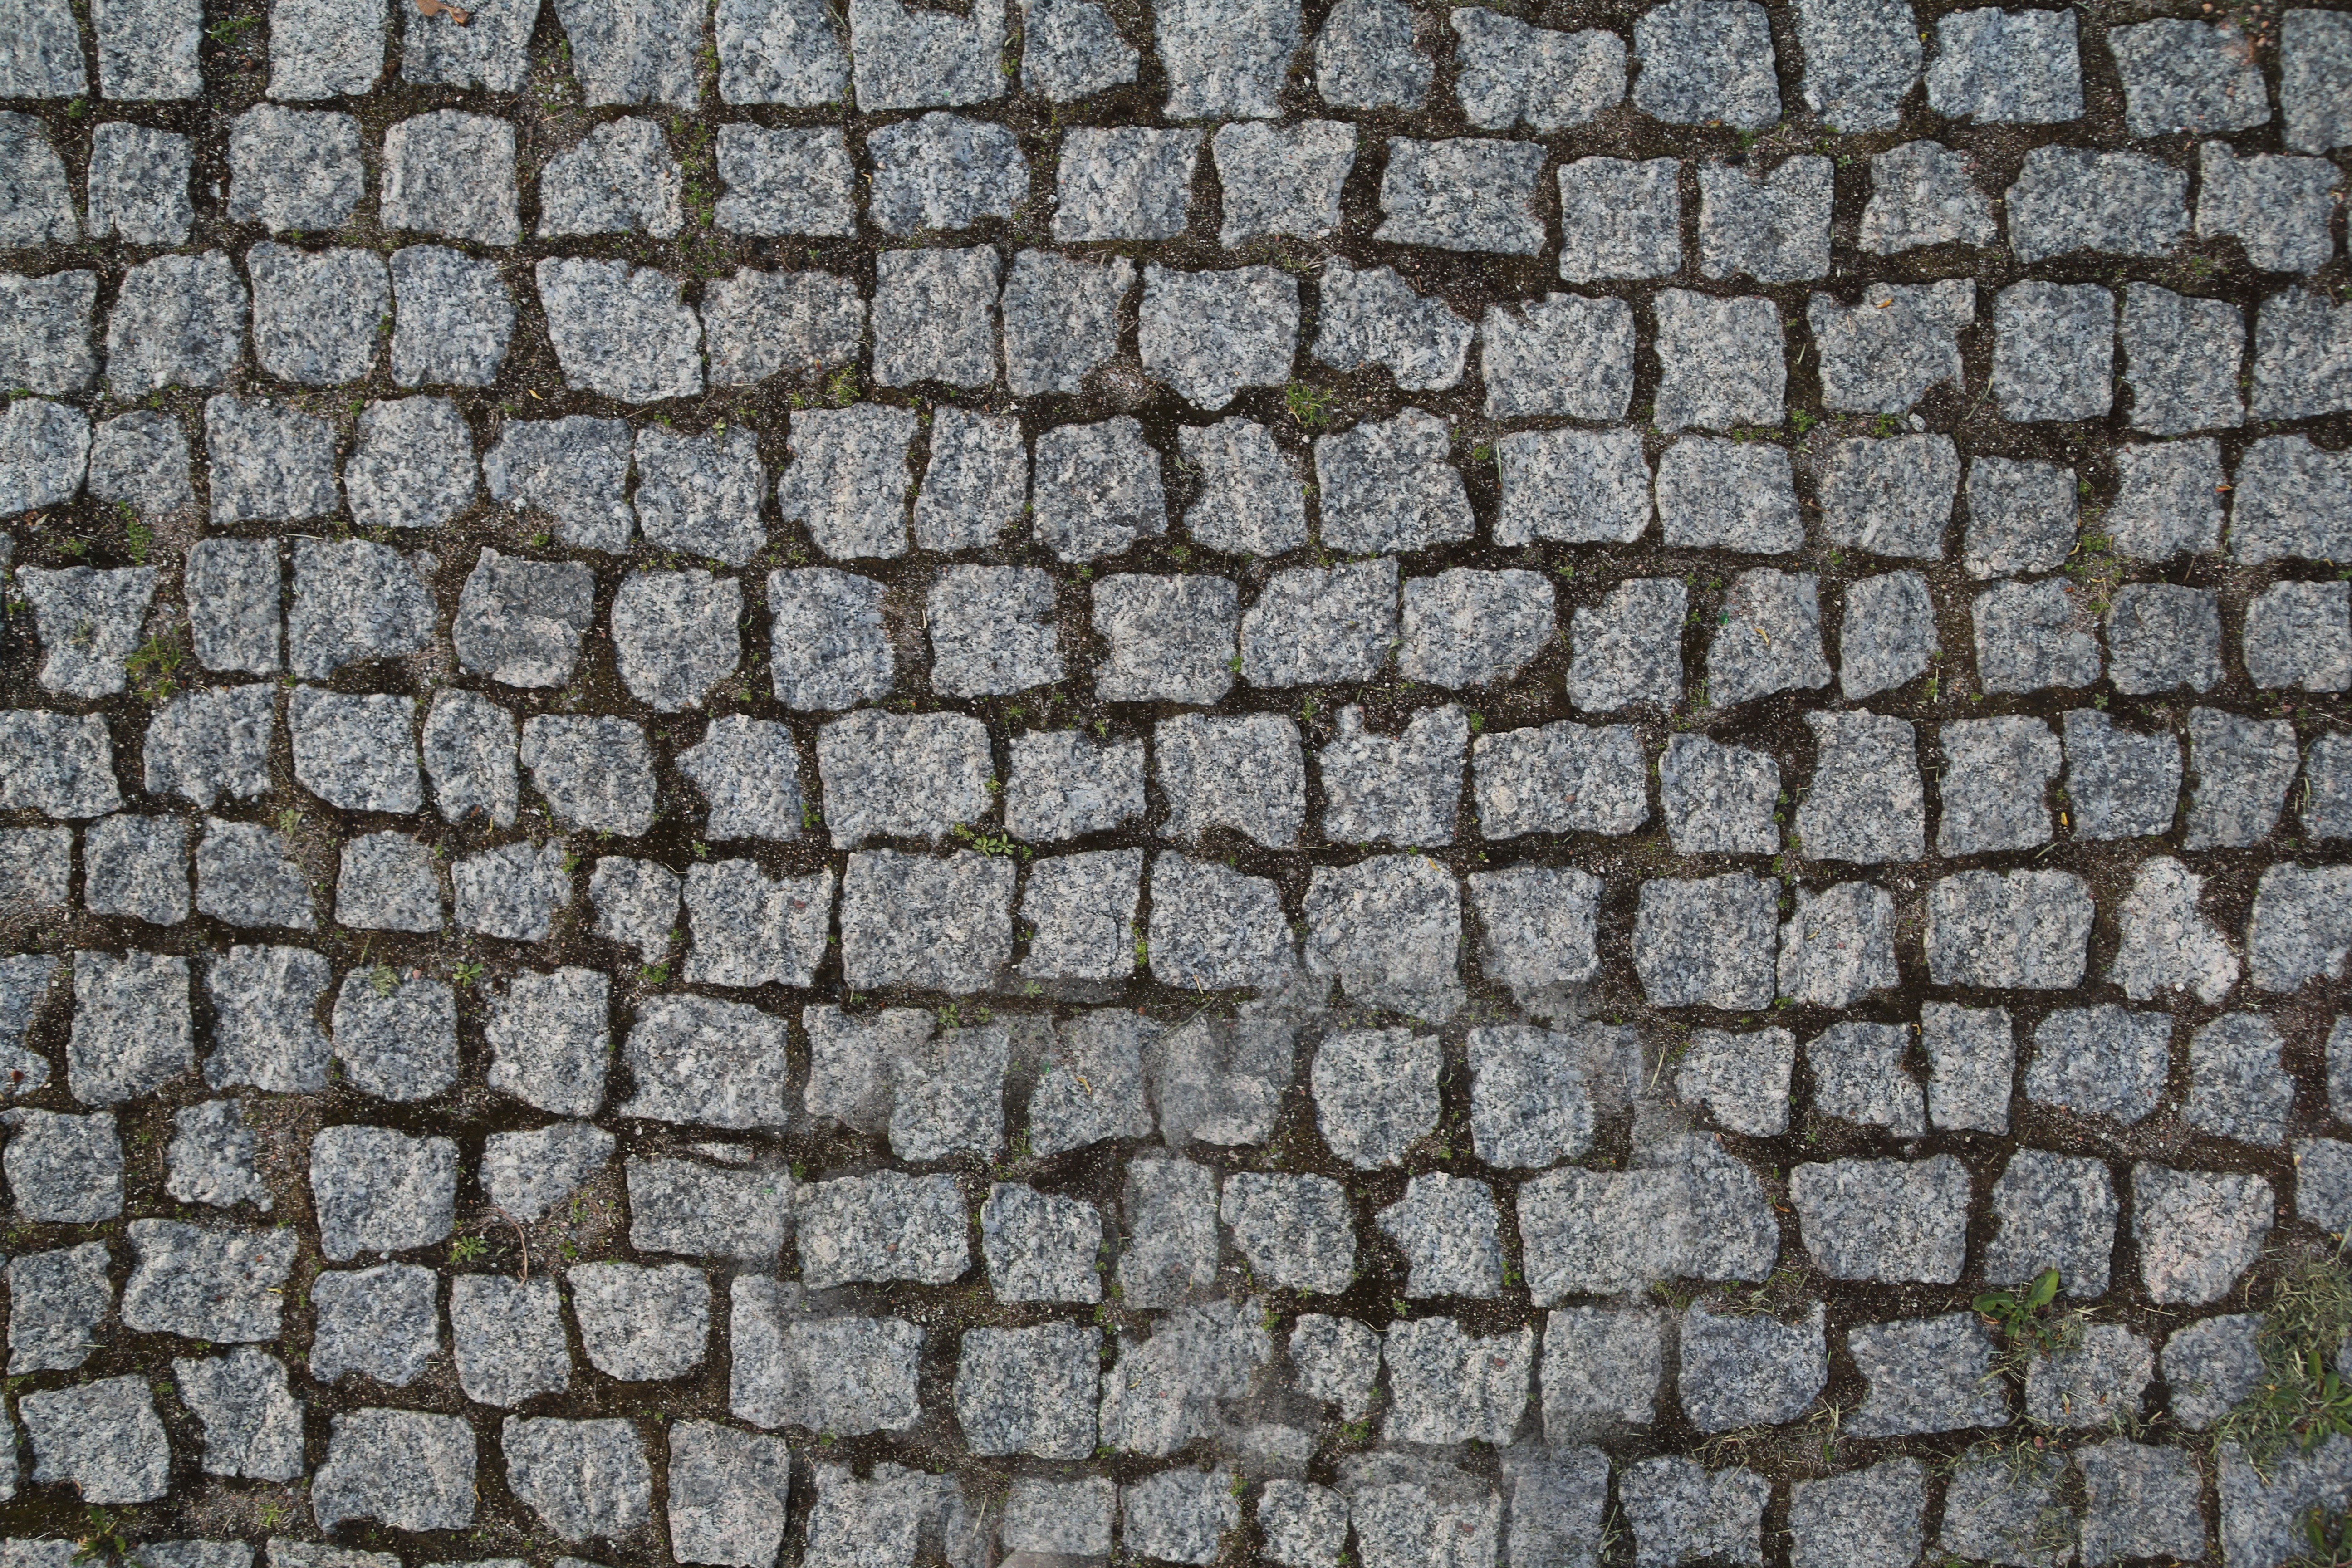 Stone pavement texture photo